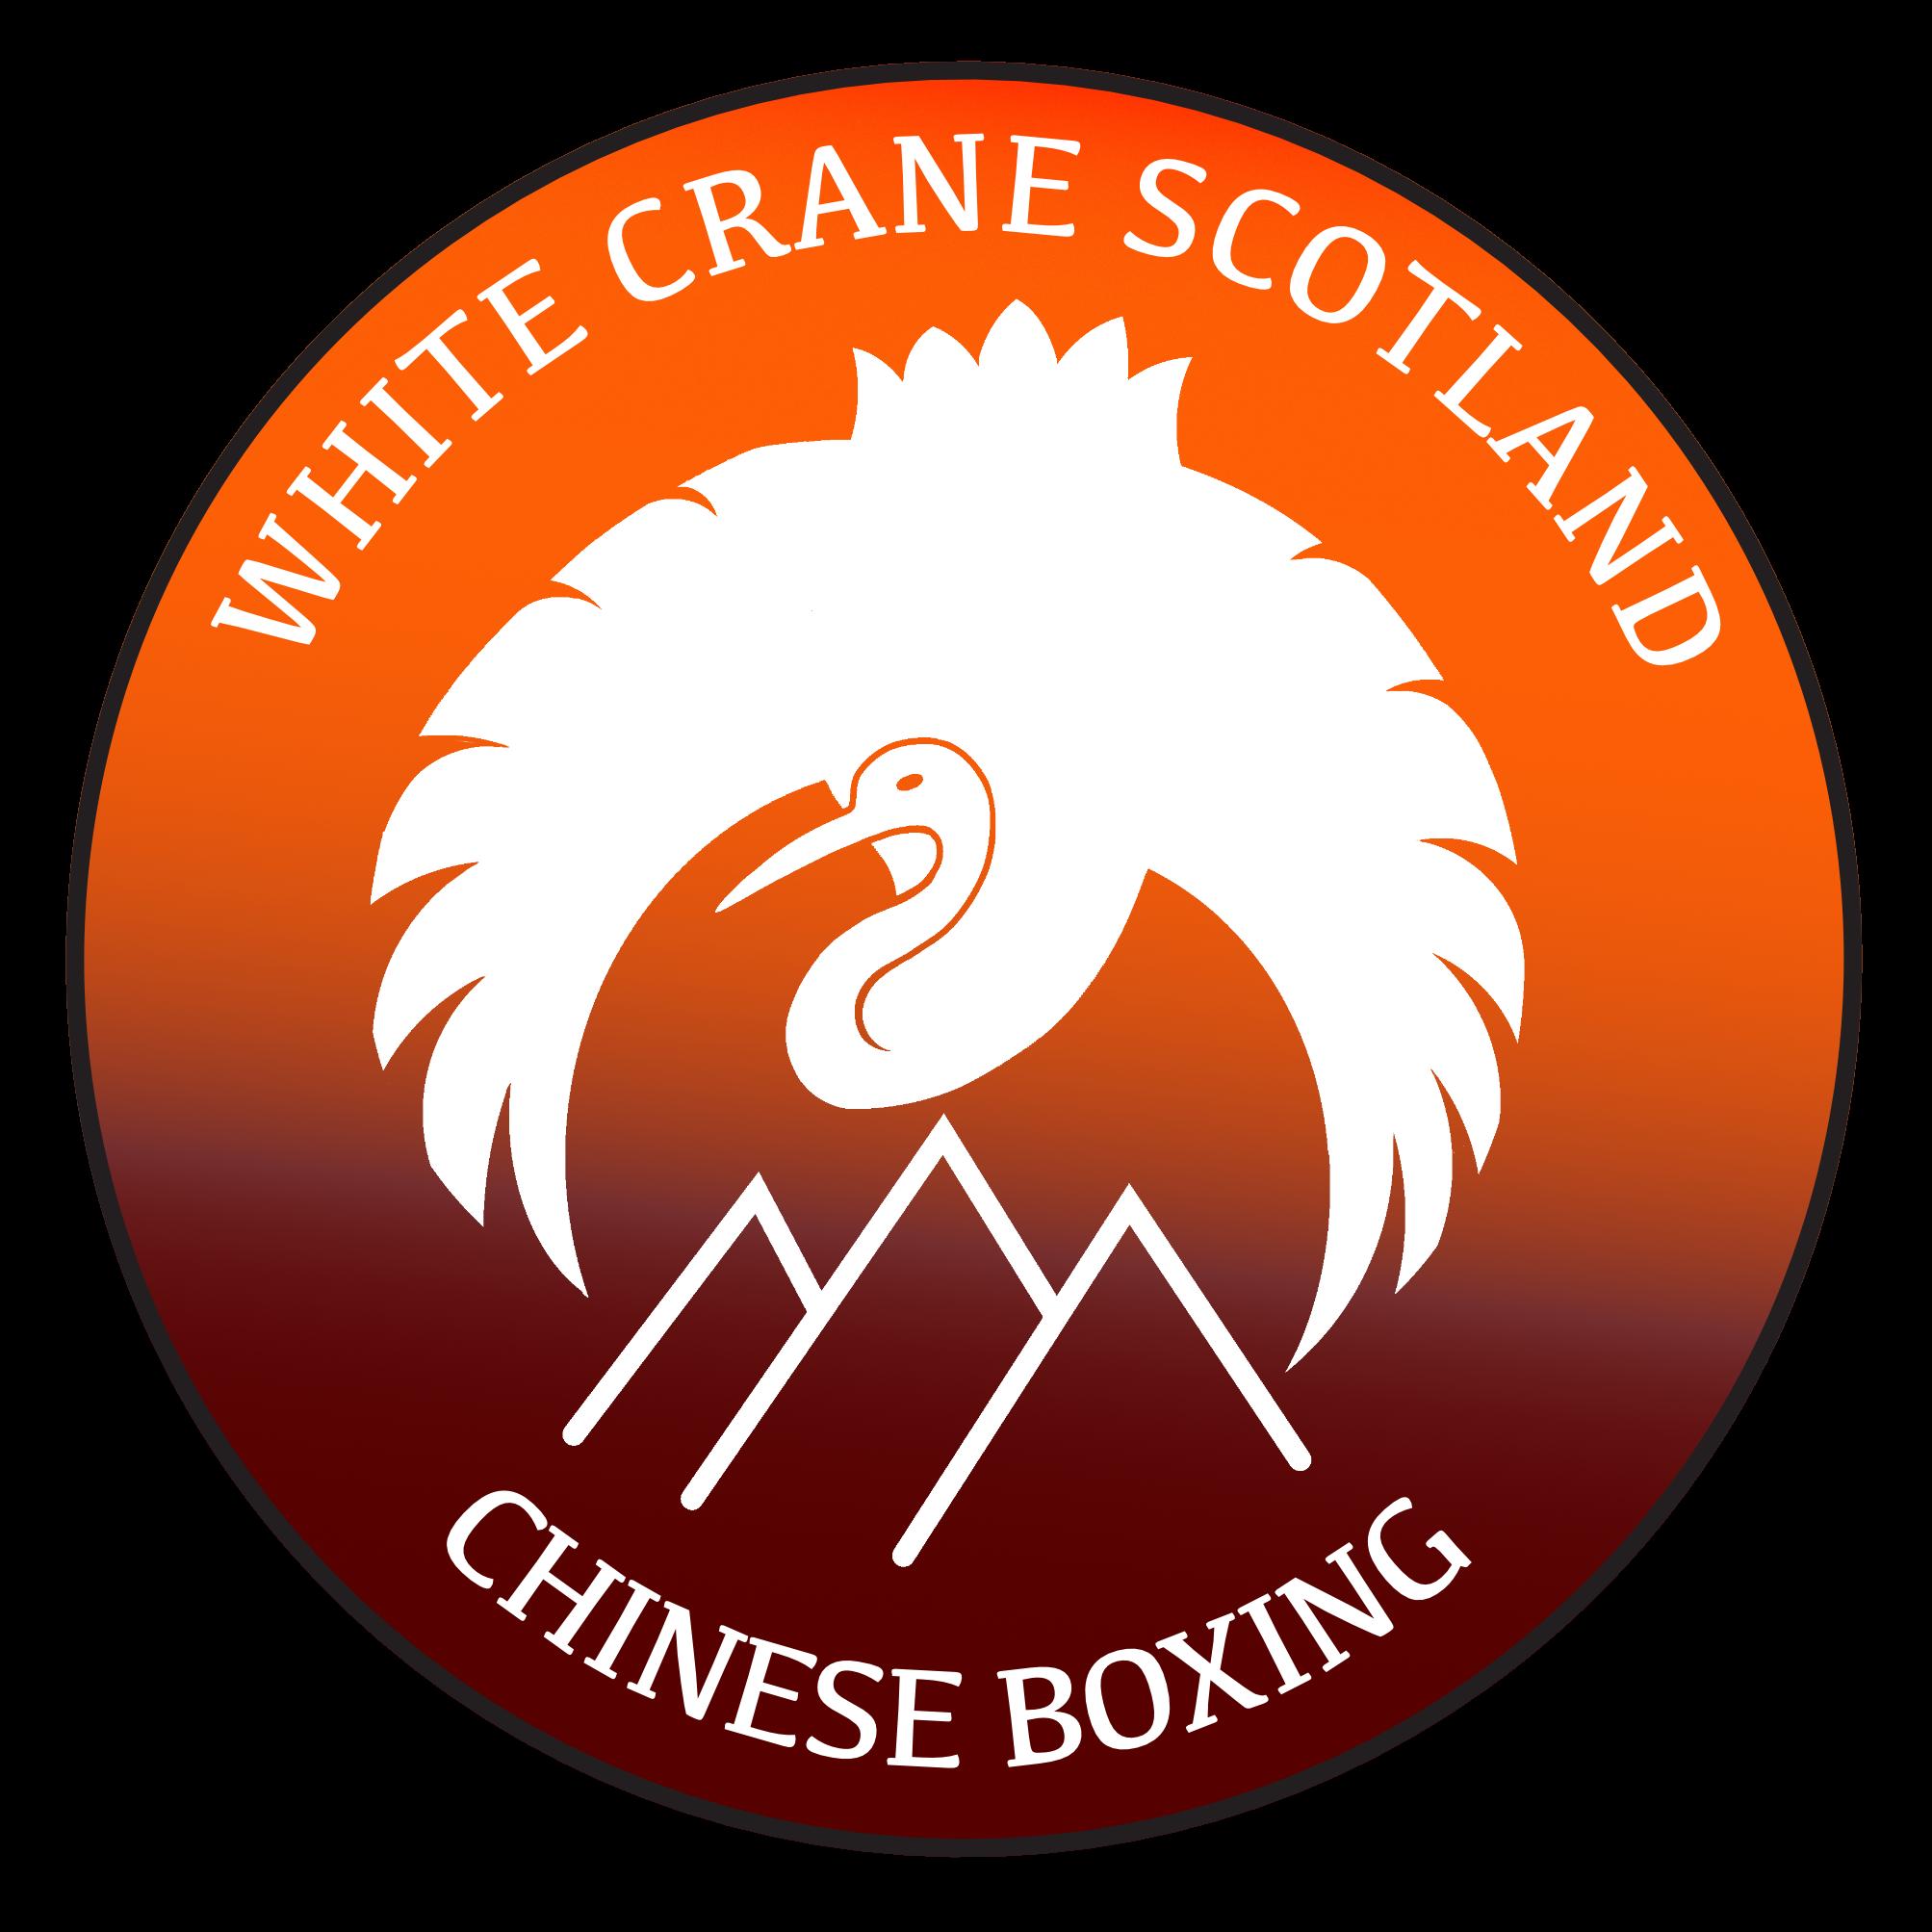 White Crane Scotland Kung Fu